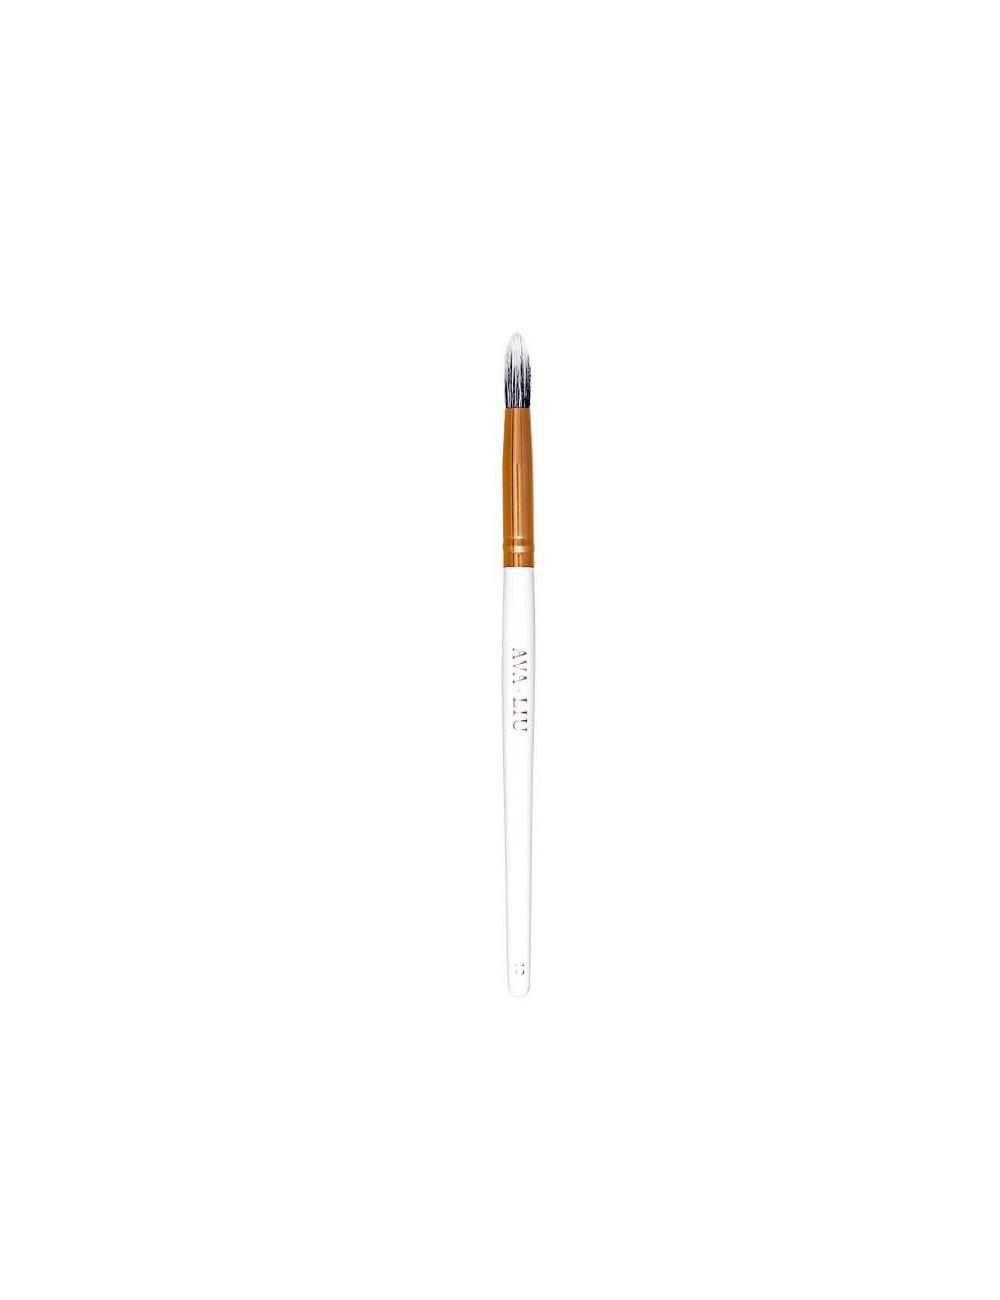 AVA.LIU 2-way blending brush - no.12